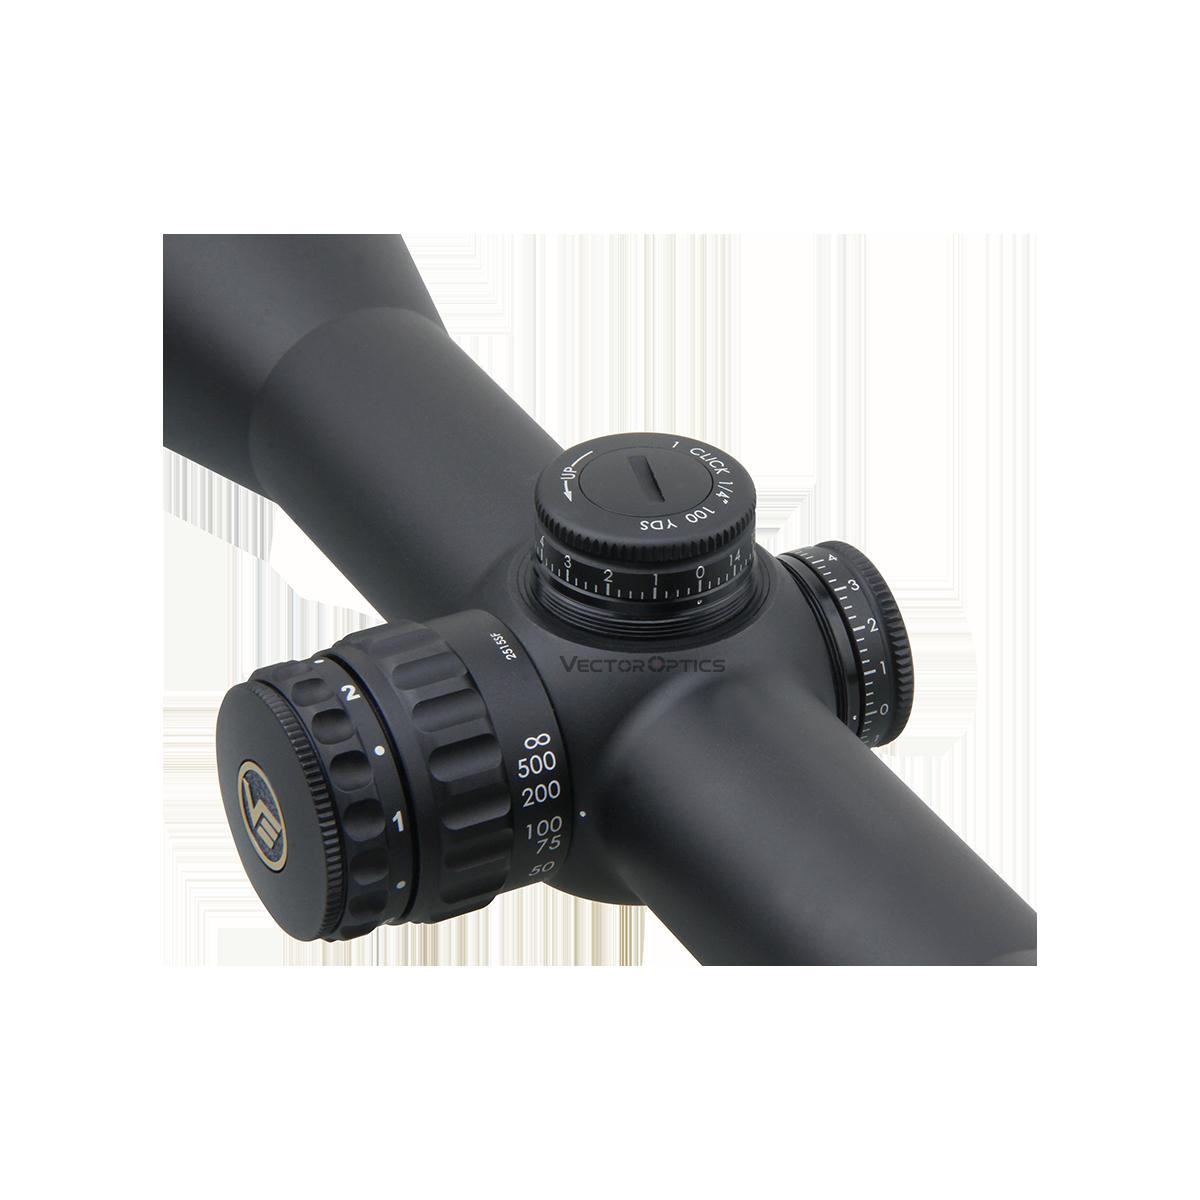 Continental 2.5-15x56 Riflescope